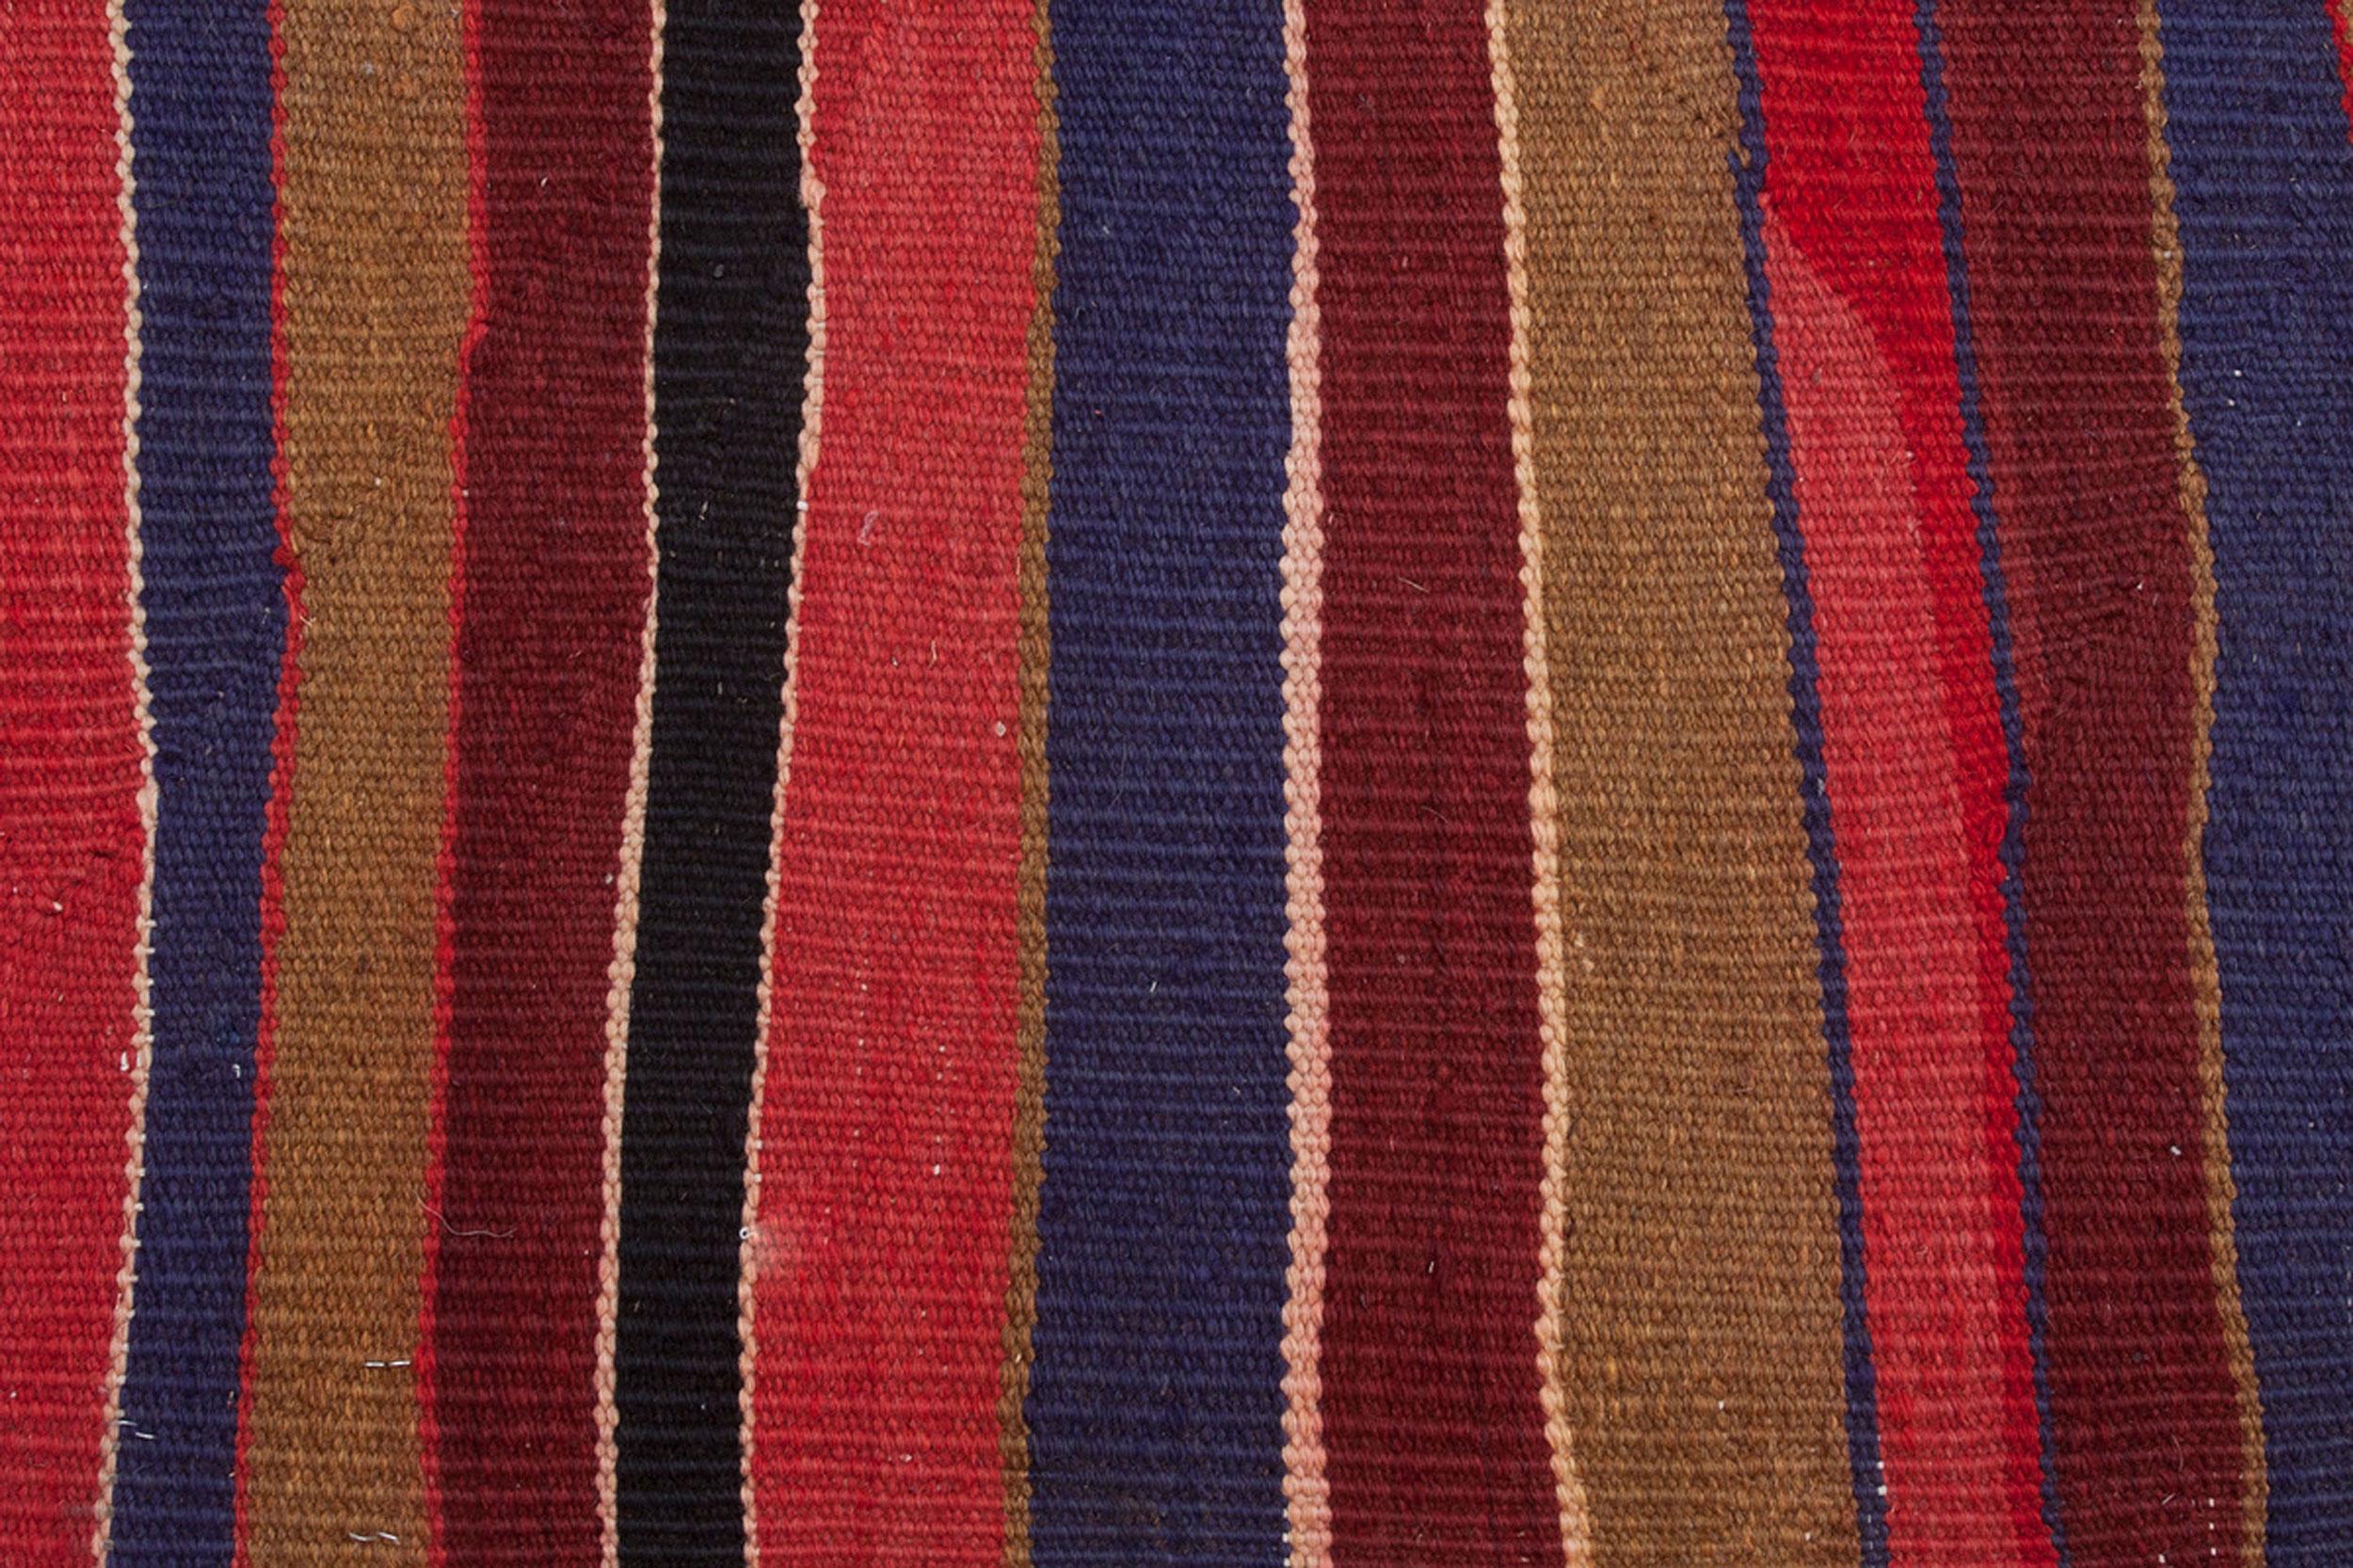 Antique Kurdish Kilim Carpet 360x207cm